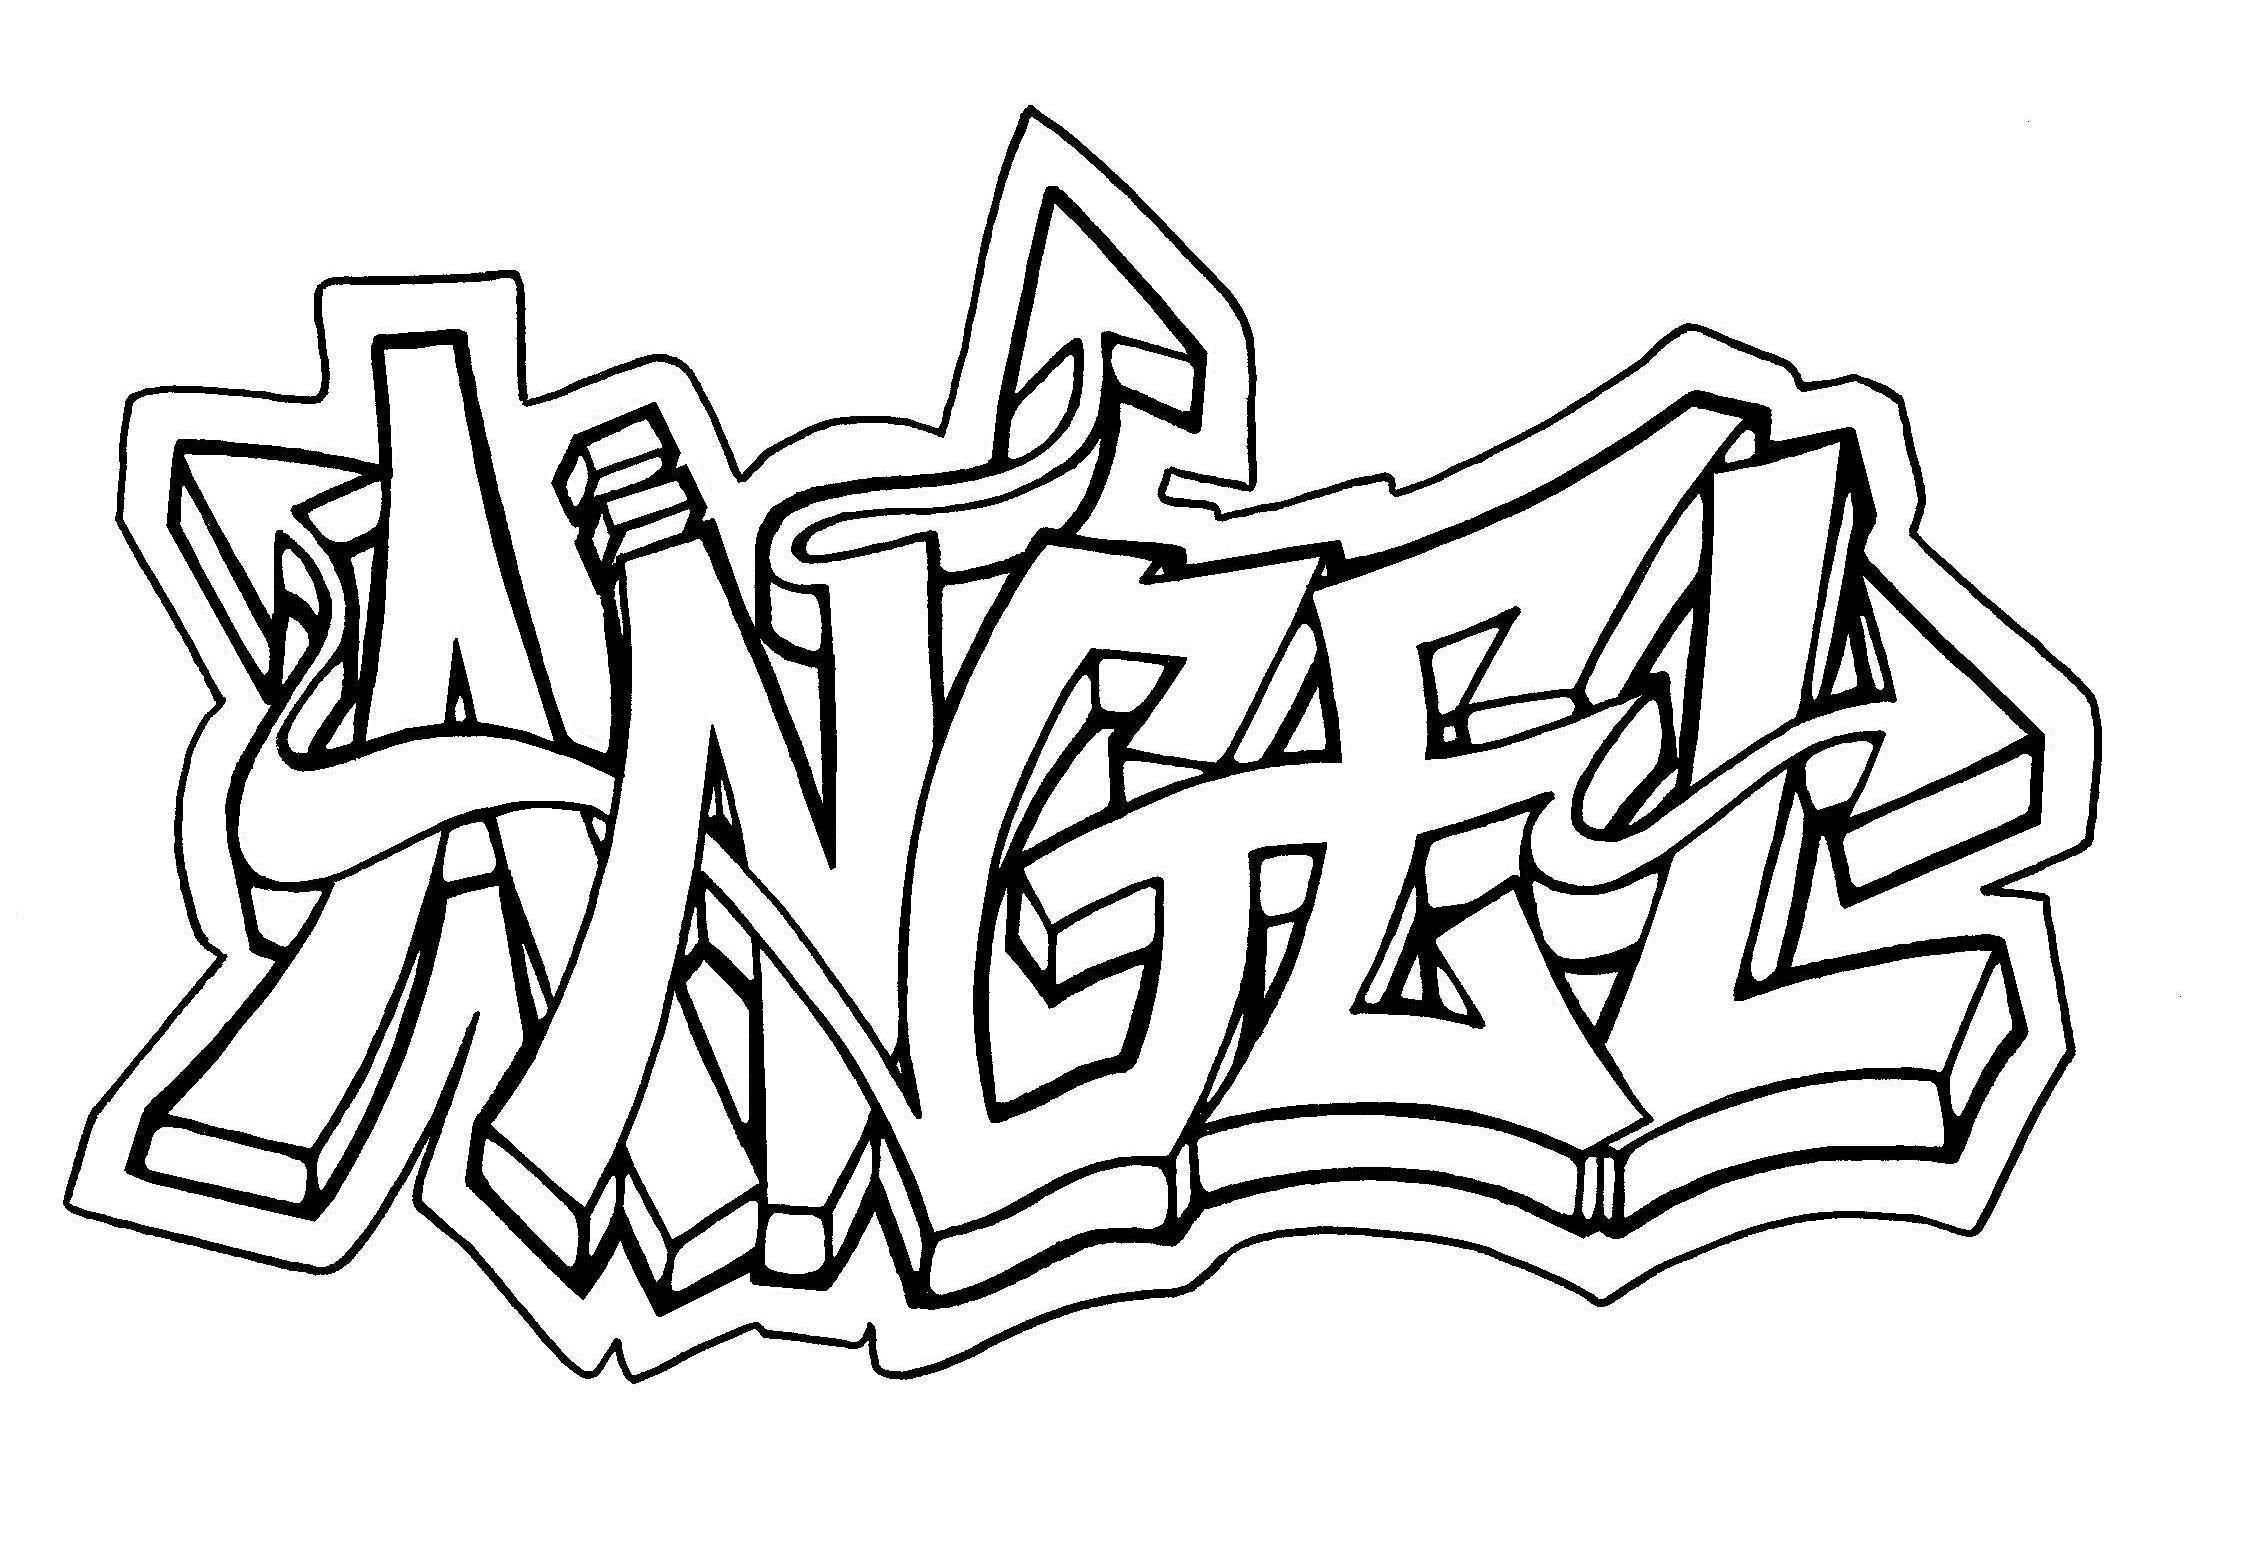 2247x1545 Cool Drawings Of Names Graffiti Drawings Of Names